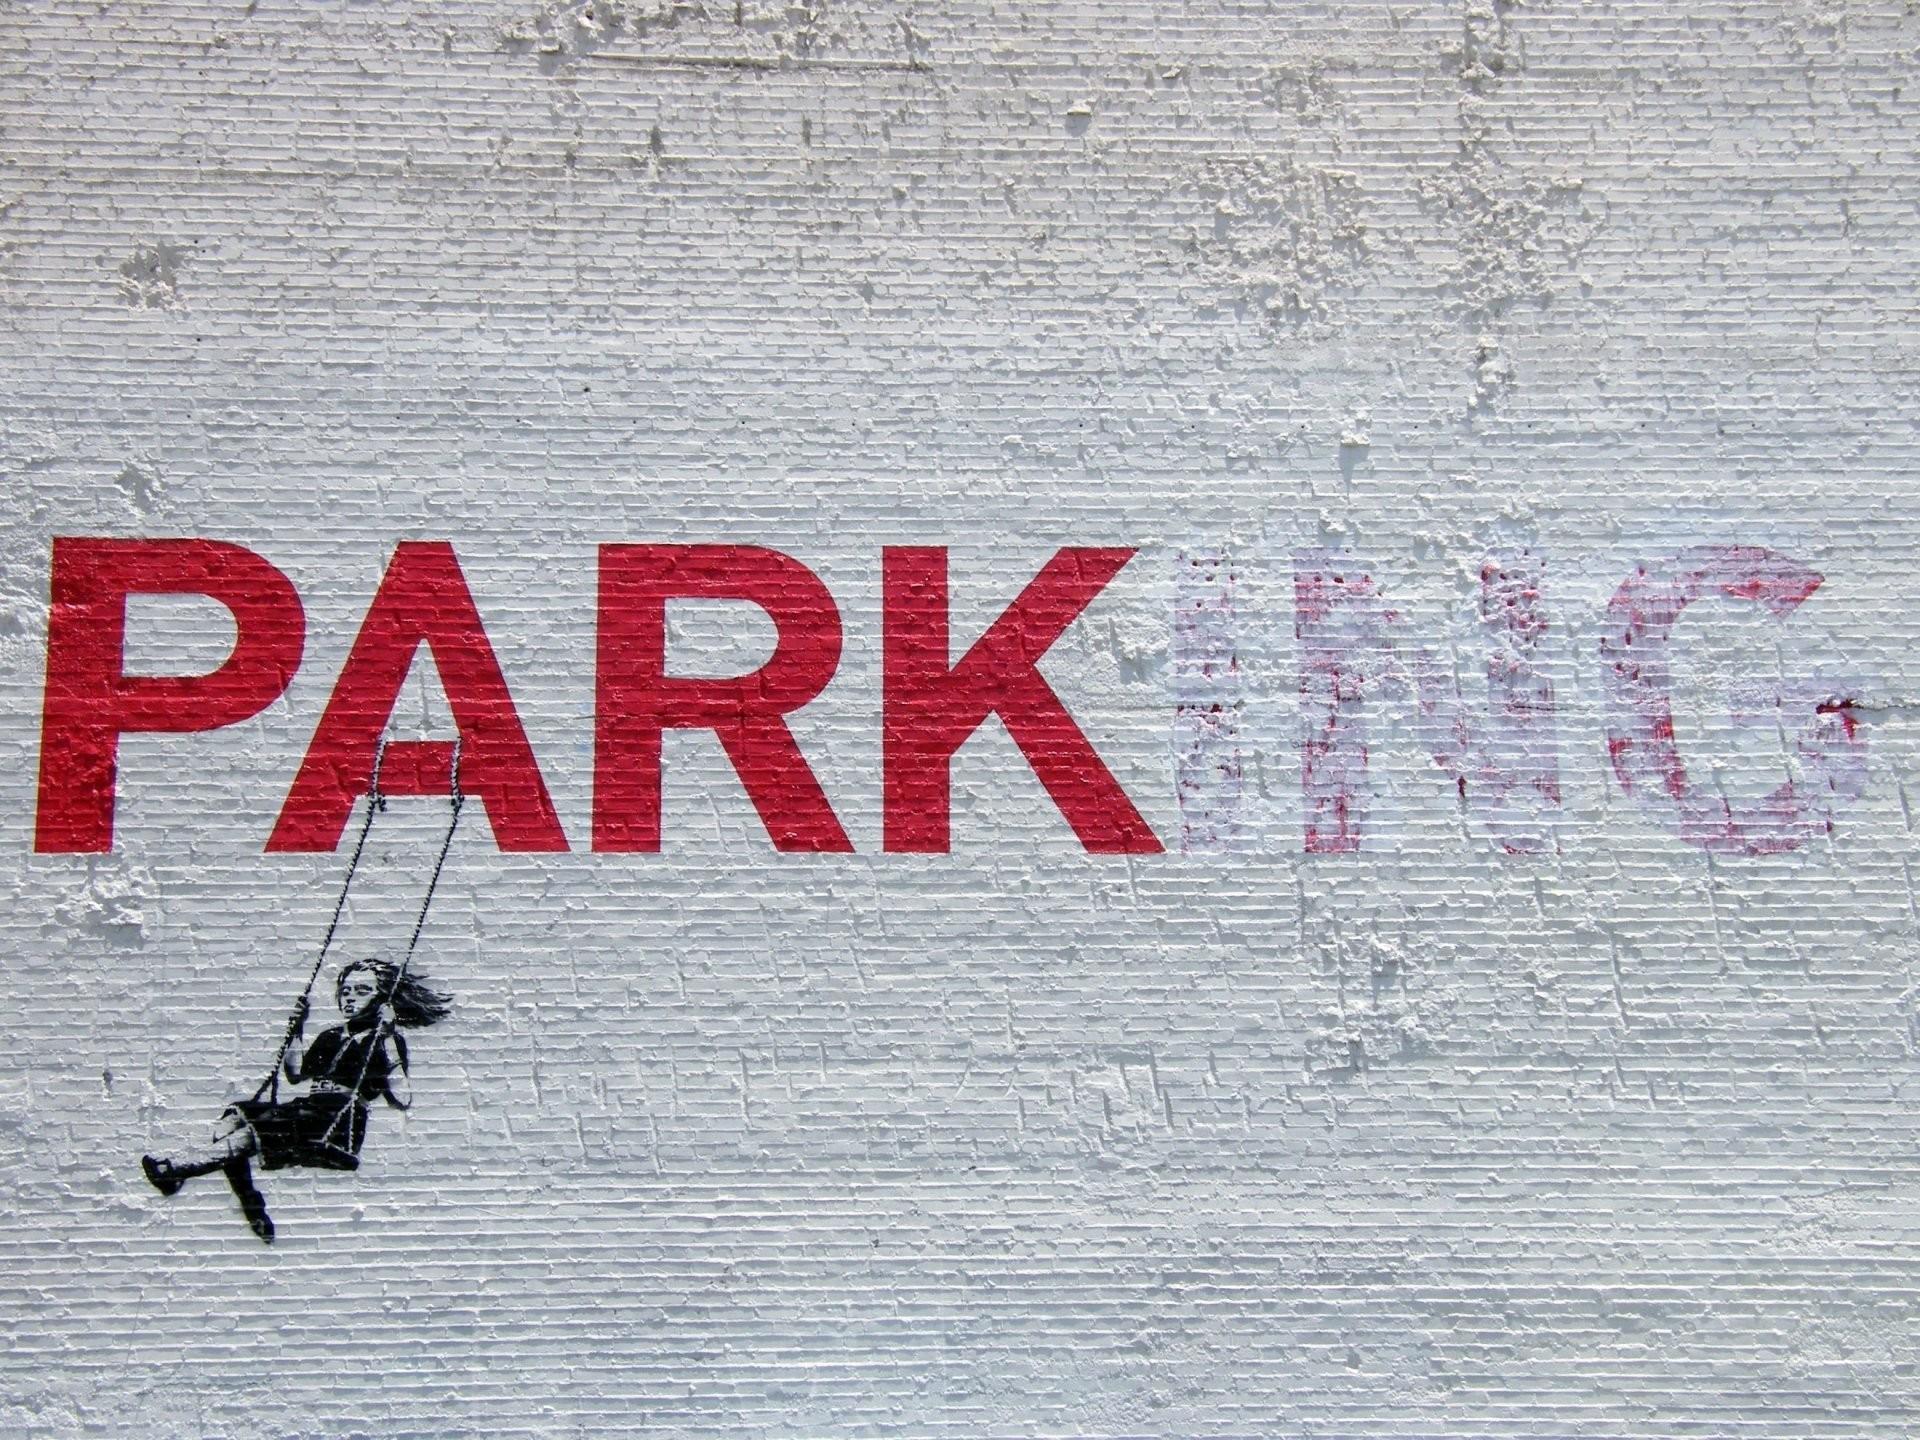 graffiti banksy park-ing stencil girl